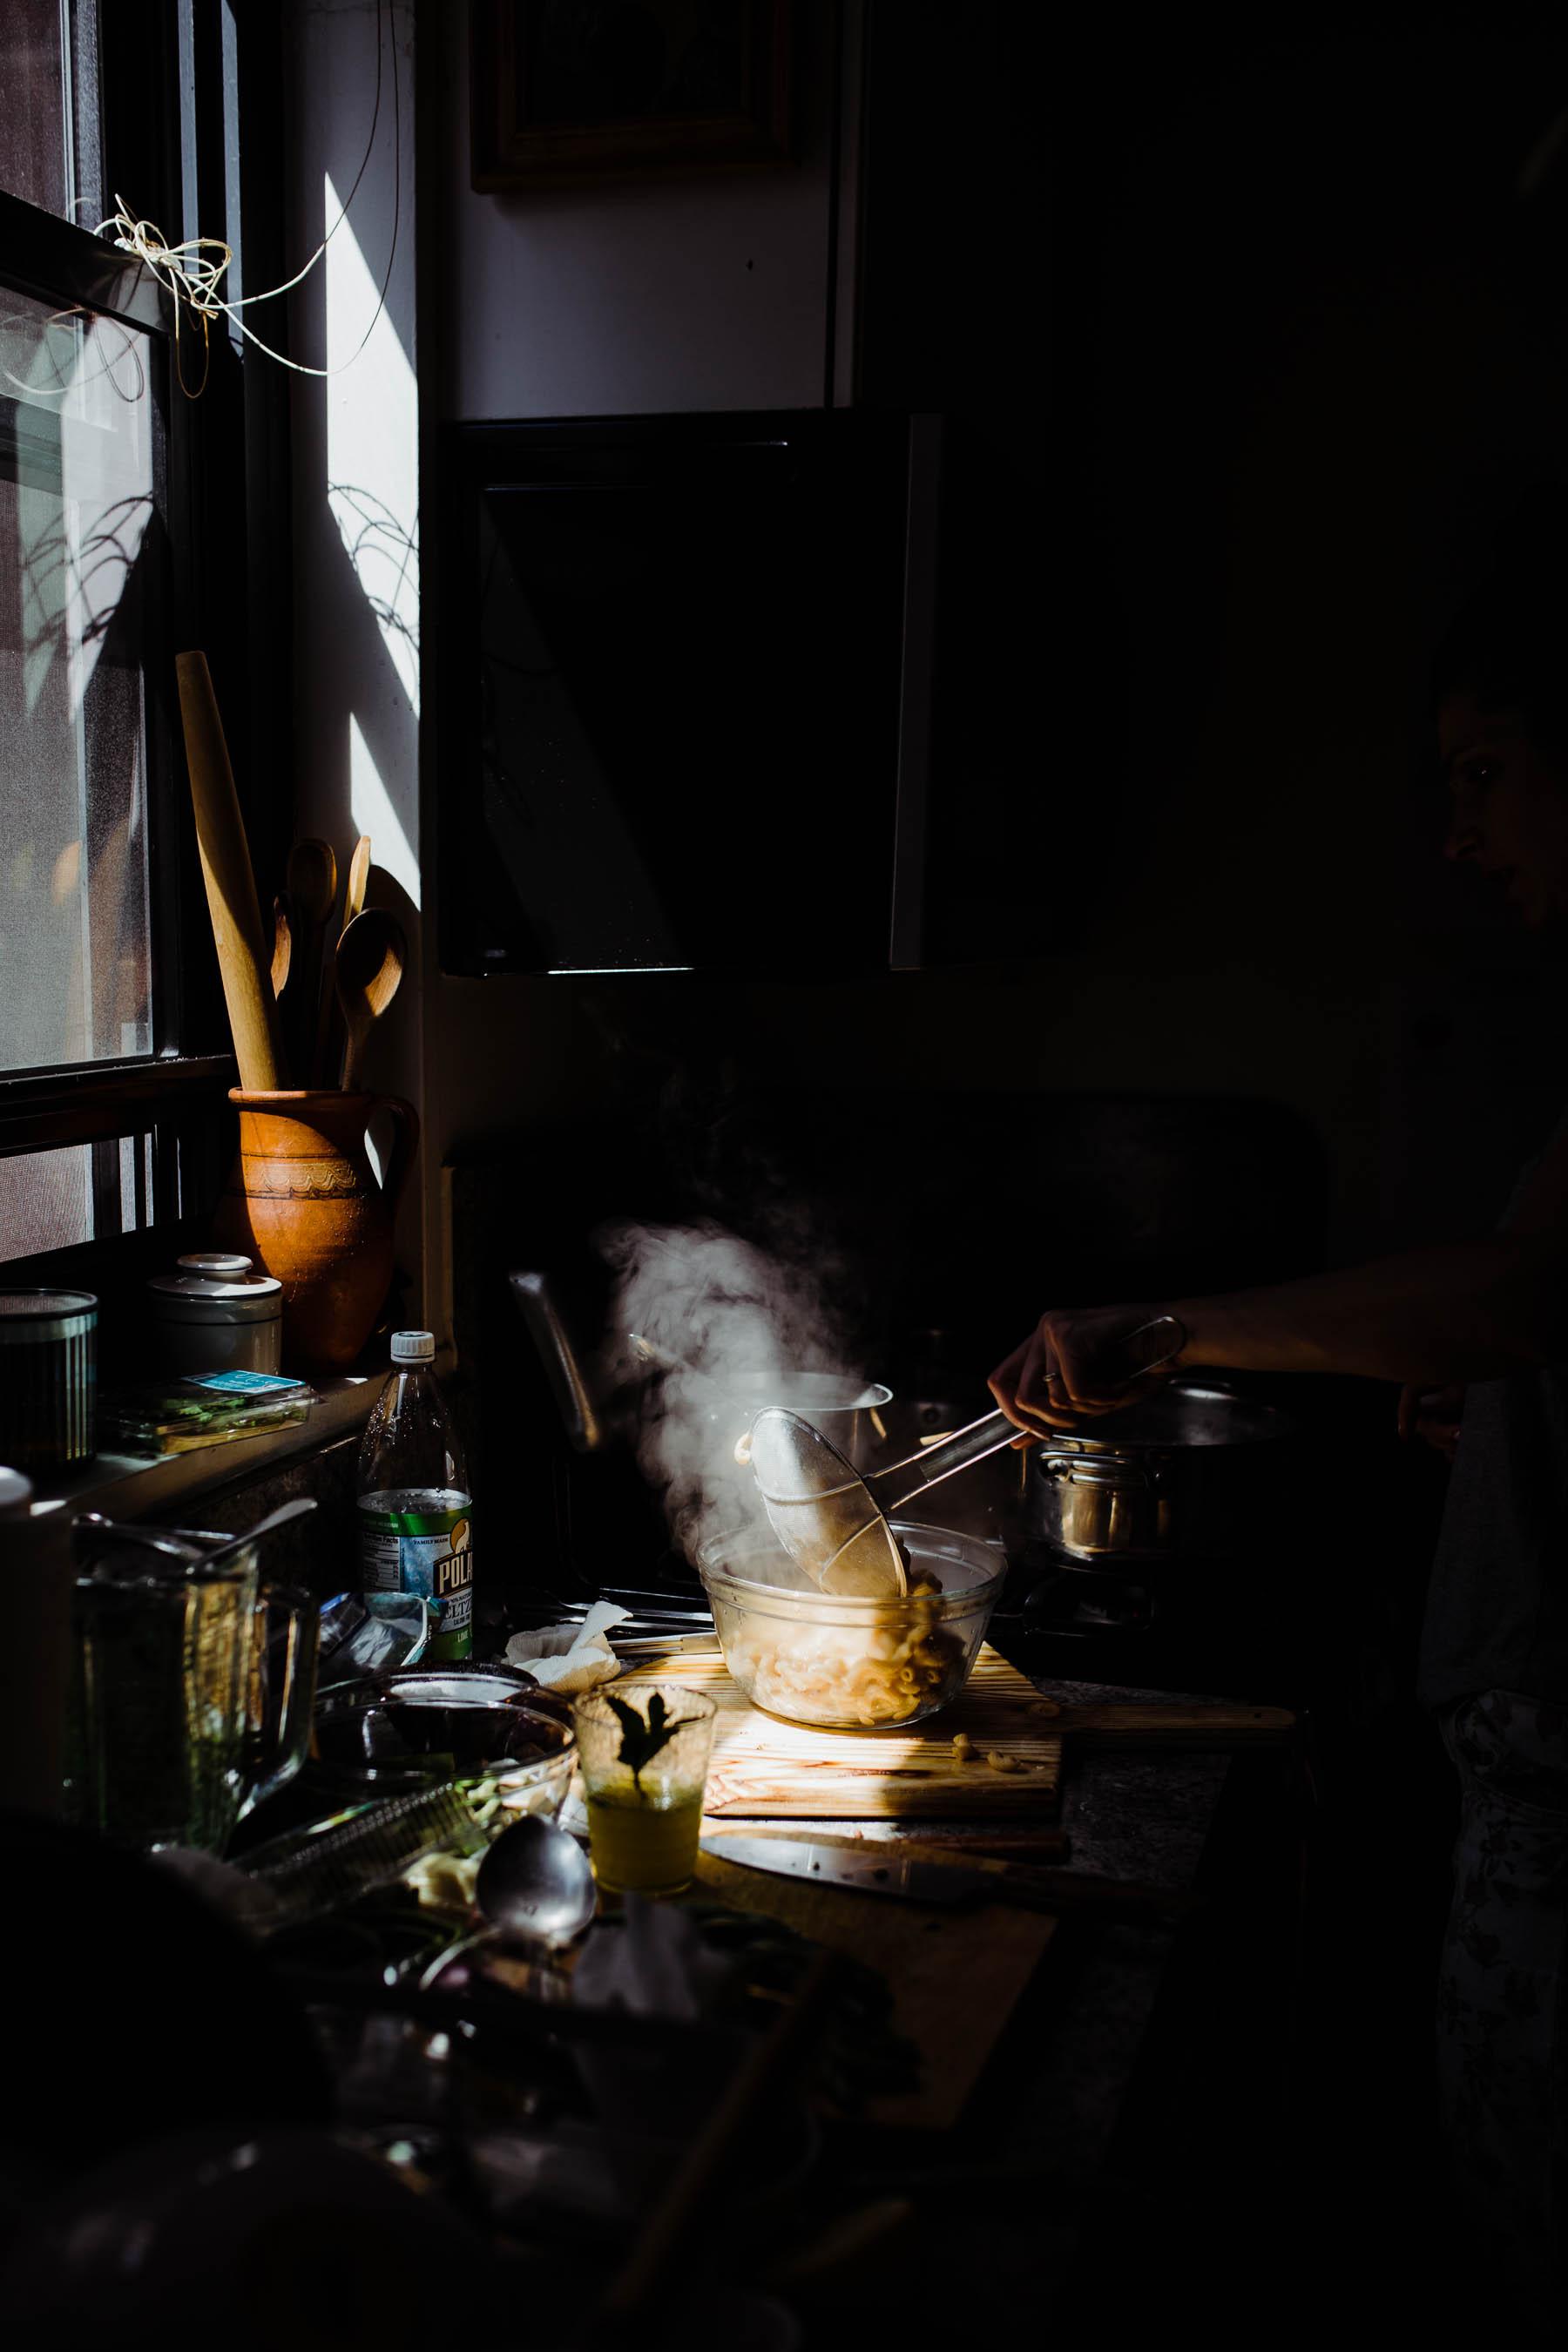 chicago-nyc-food-lifestyle-photographer-40.jpg